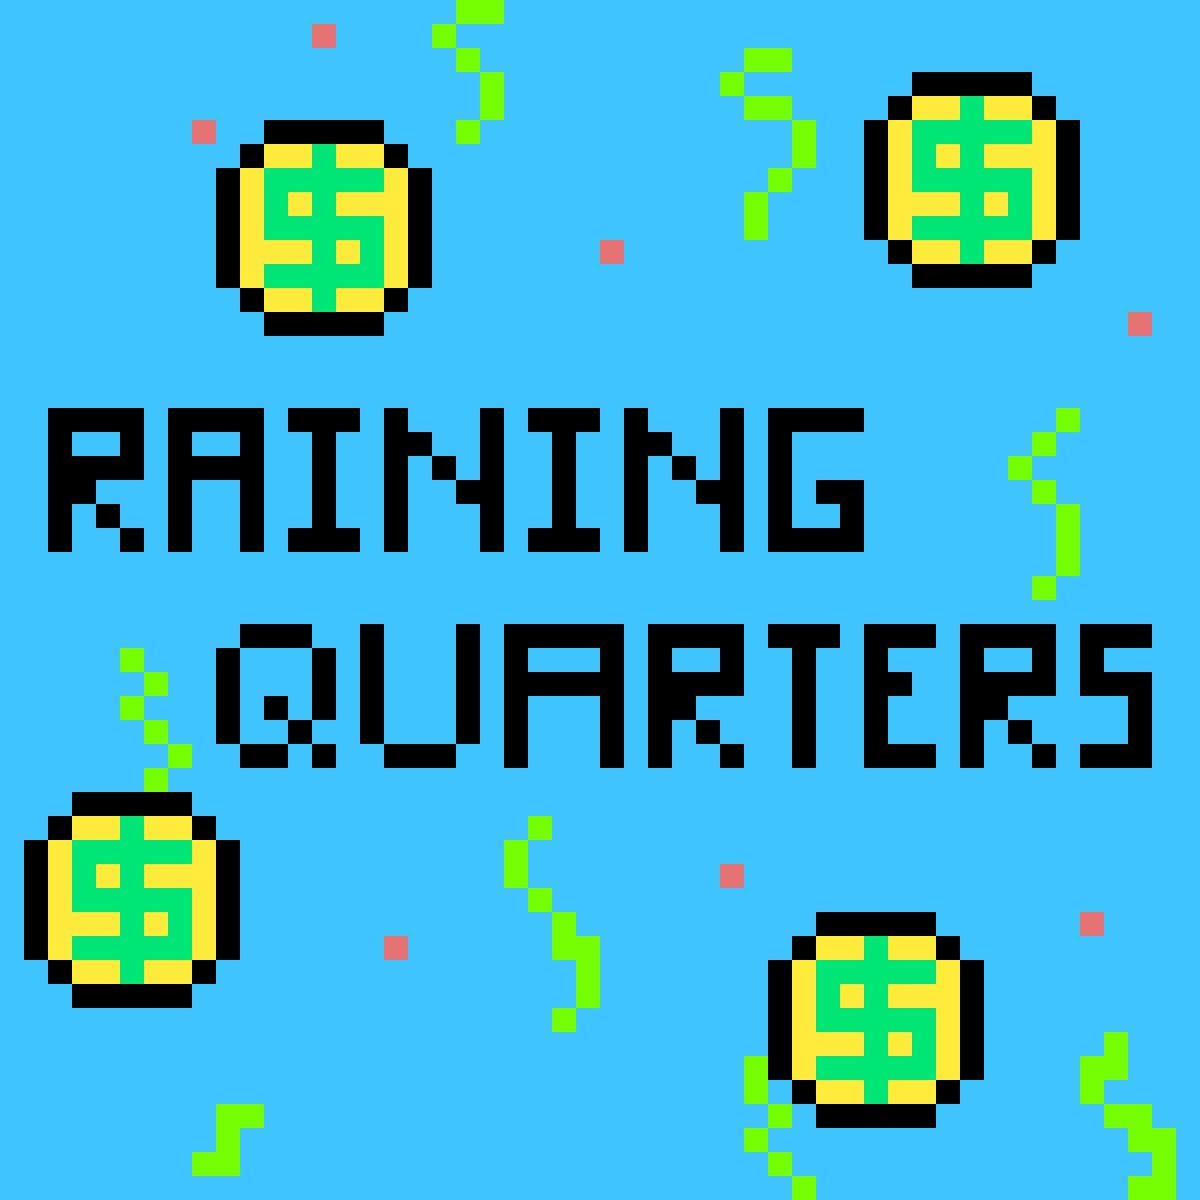 Raining quarters by yeeangel